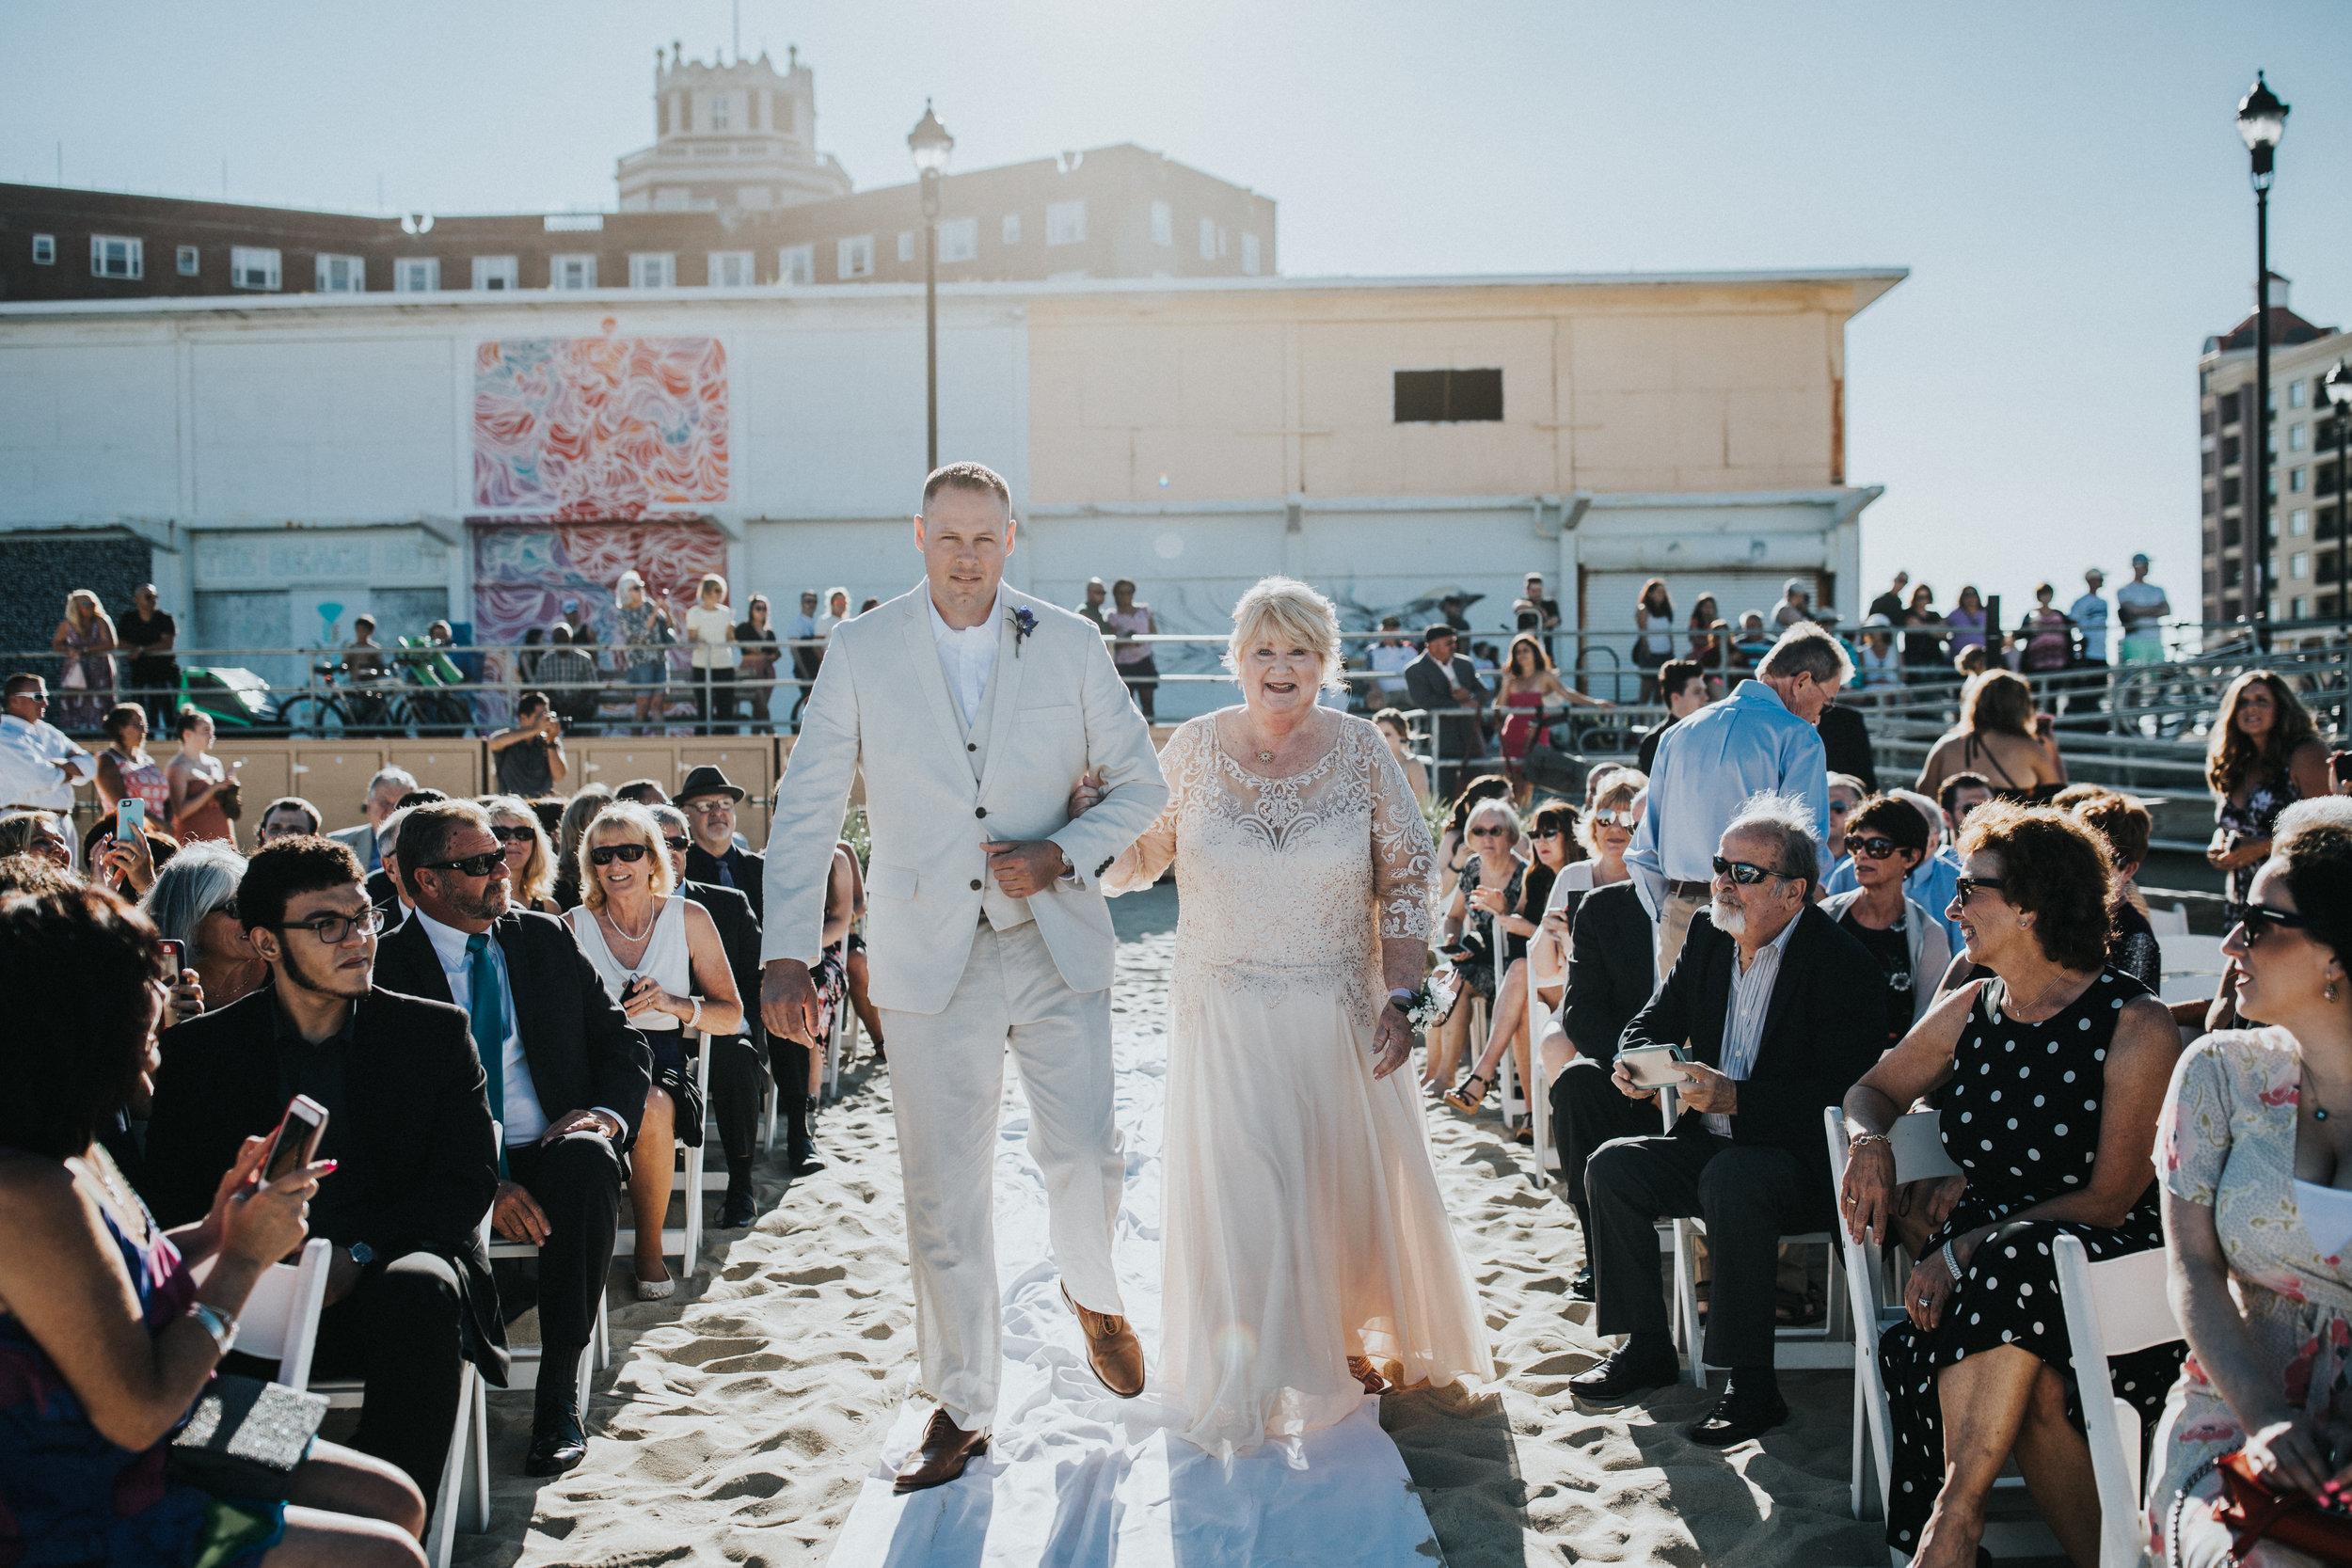 JennaLynnPhotography-NJWeddingPhotographer-Wedding-TheBerkeley-AsburyPark-Allison&Michael-Ceremony-9.jpg